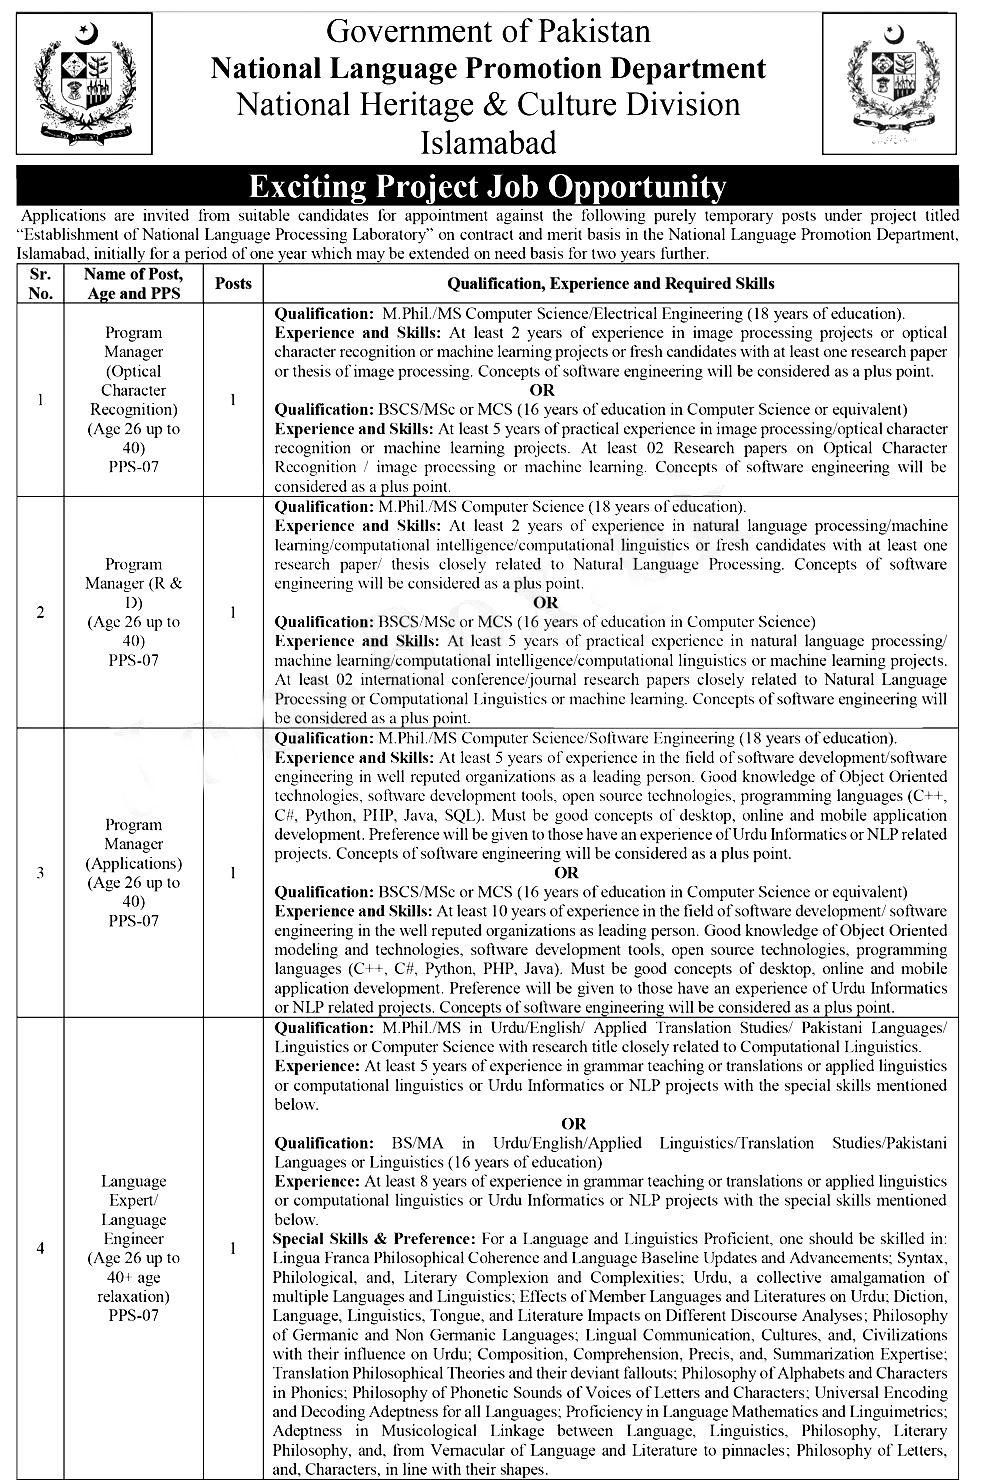 National Language Promotion Department NLPD Jobs 2021